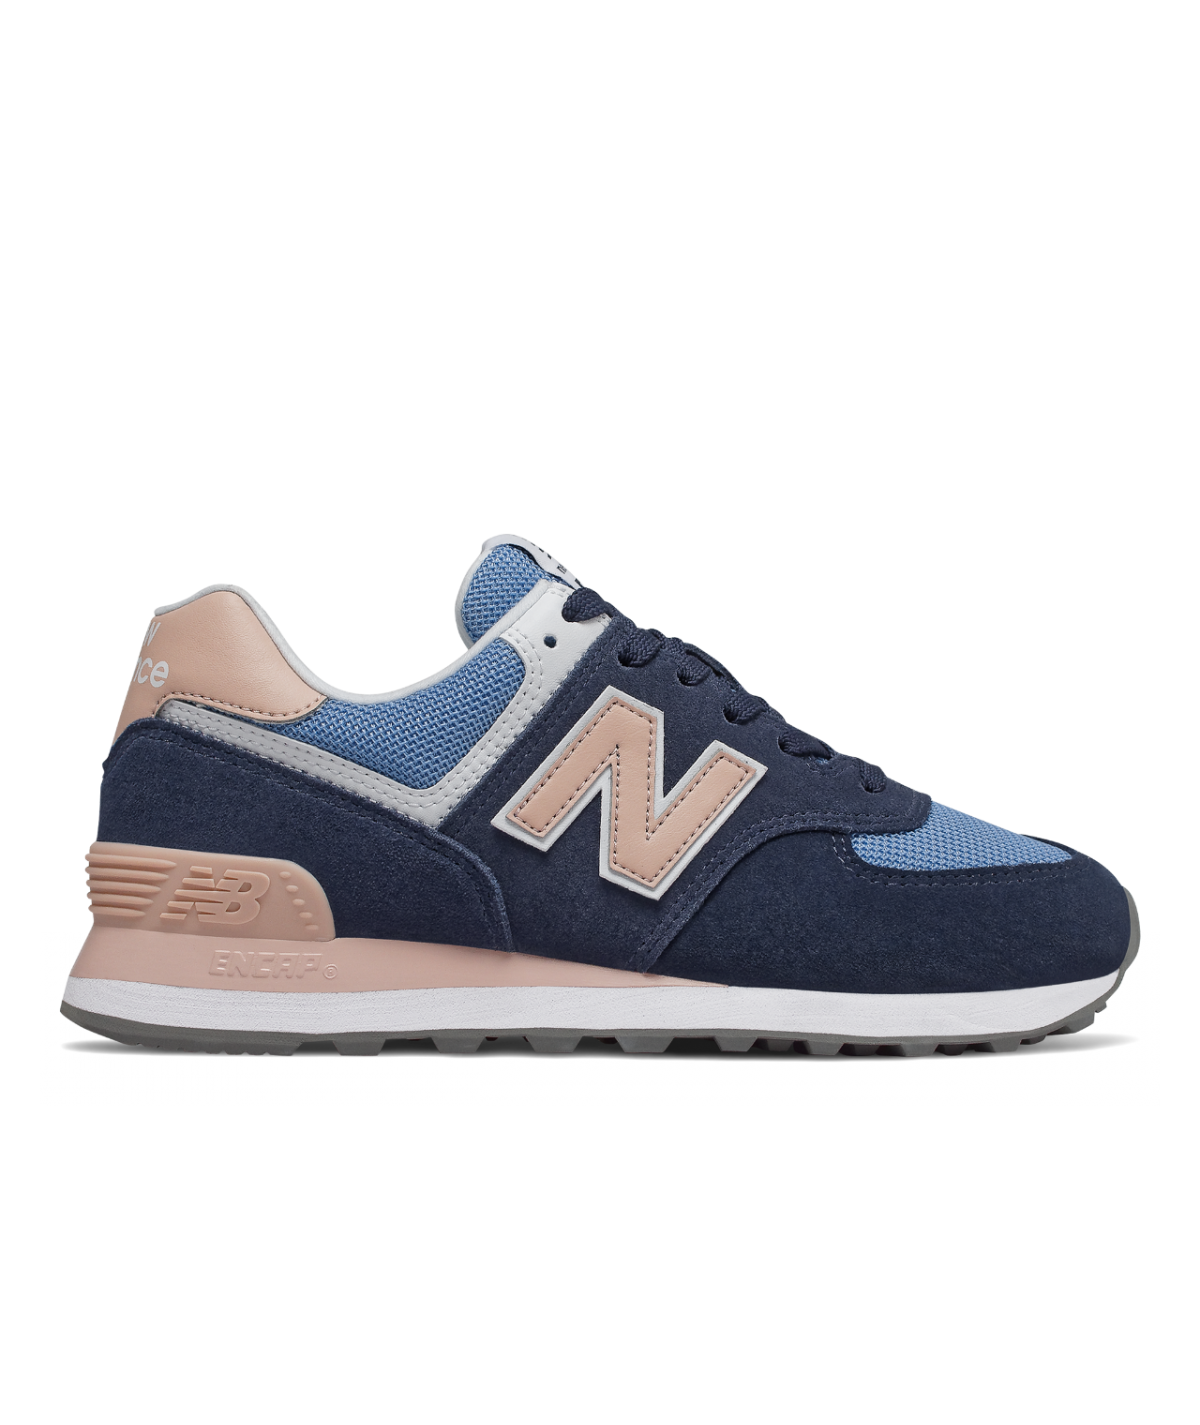 Details zu New Balance Turnschuhe Damen Sneaker Schuhe Freizeitsneaker Blau 574 Fashion